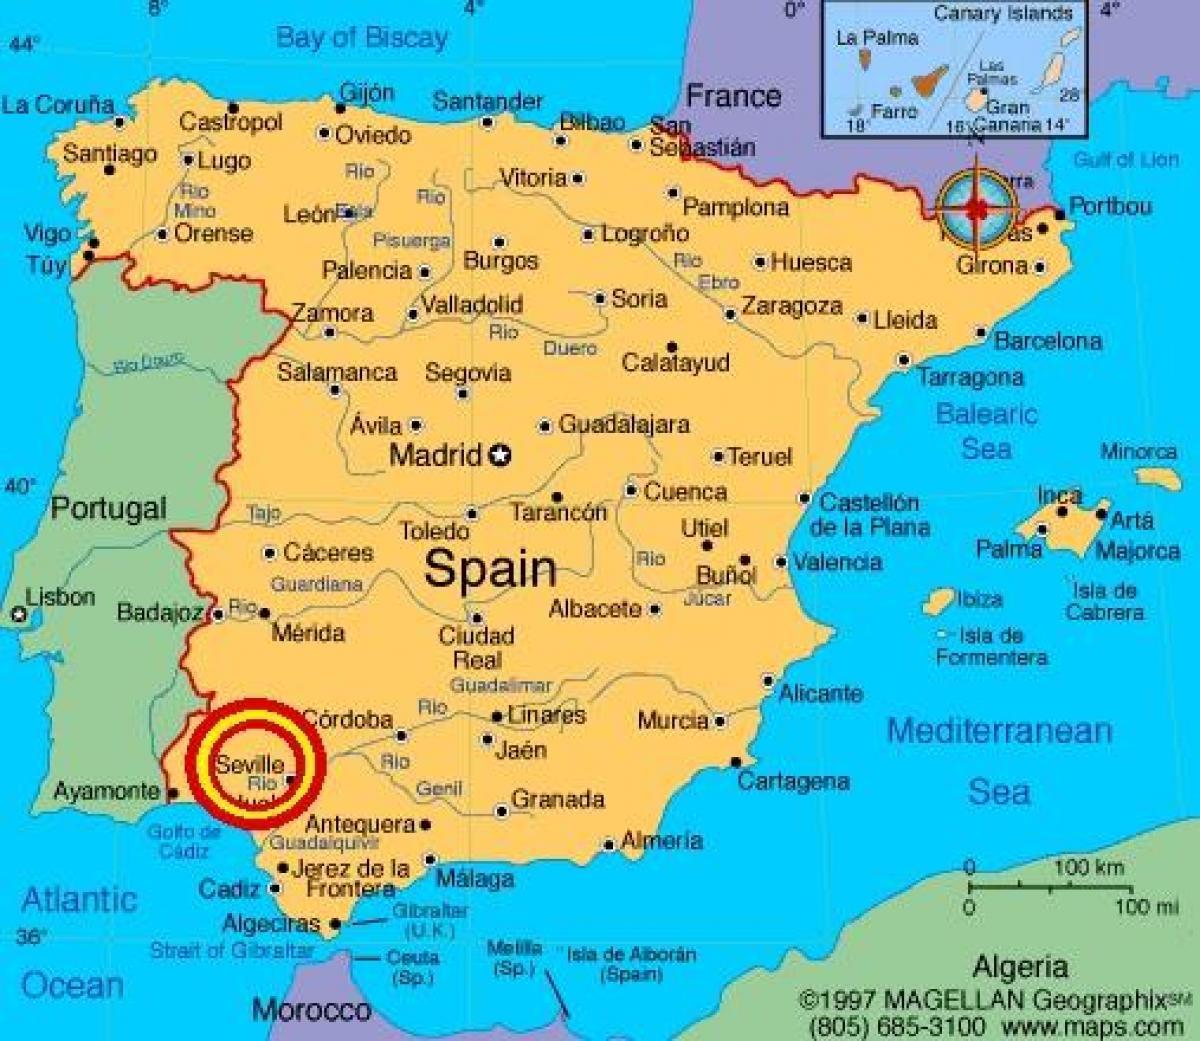 Sevilla Espanjassa Kartta Sevilla Espana Kartta Andalusia Espanja